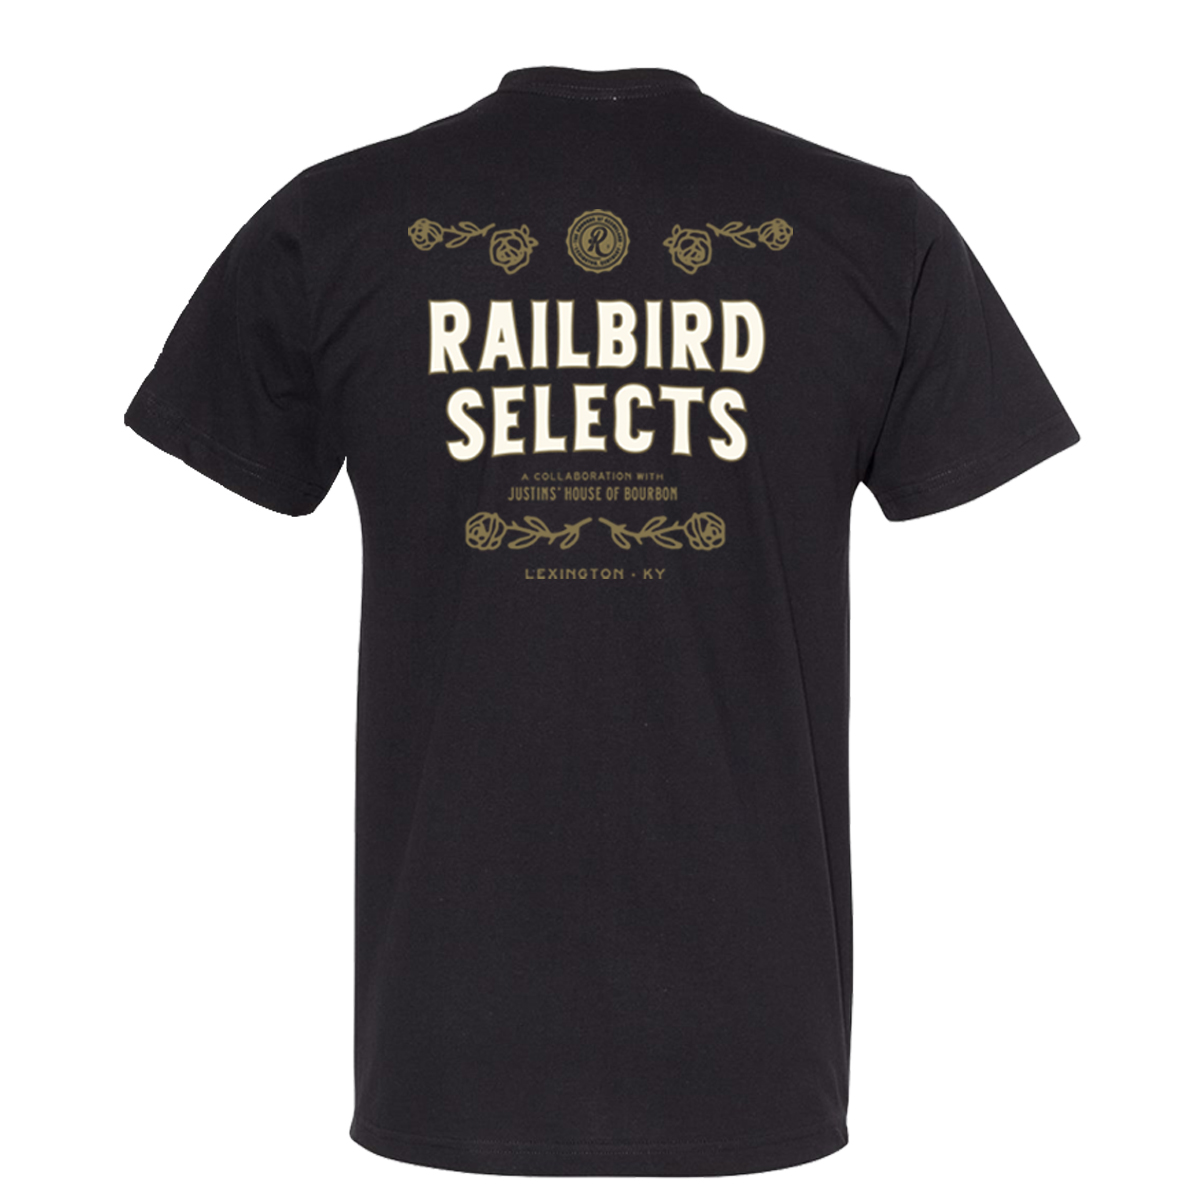 Limited Edition Railbird Selects Unisex Tee